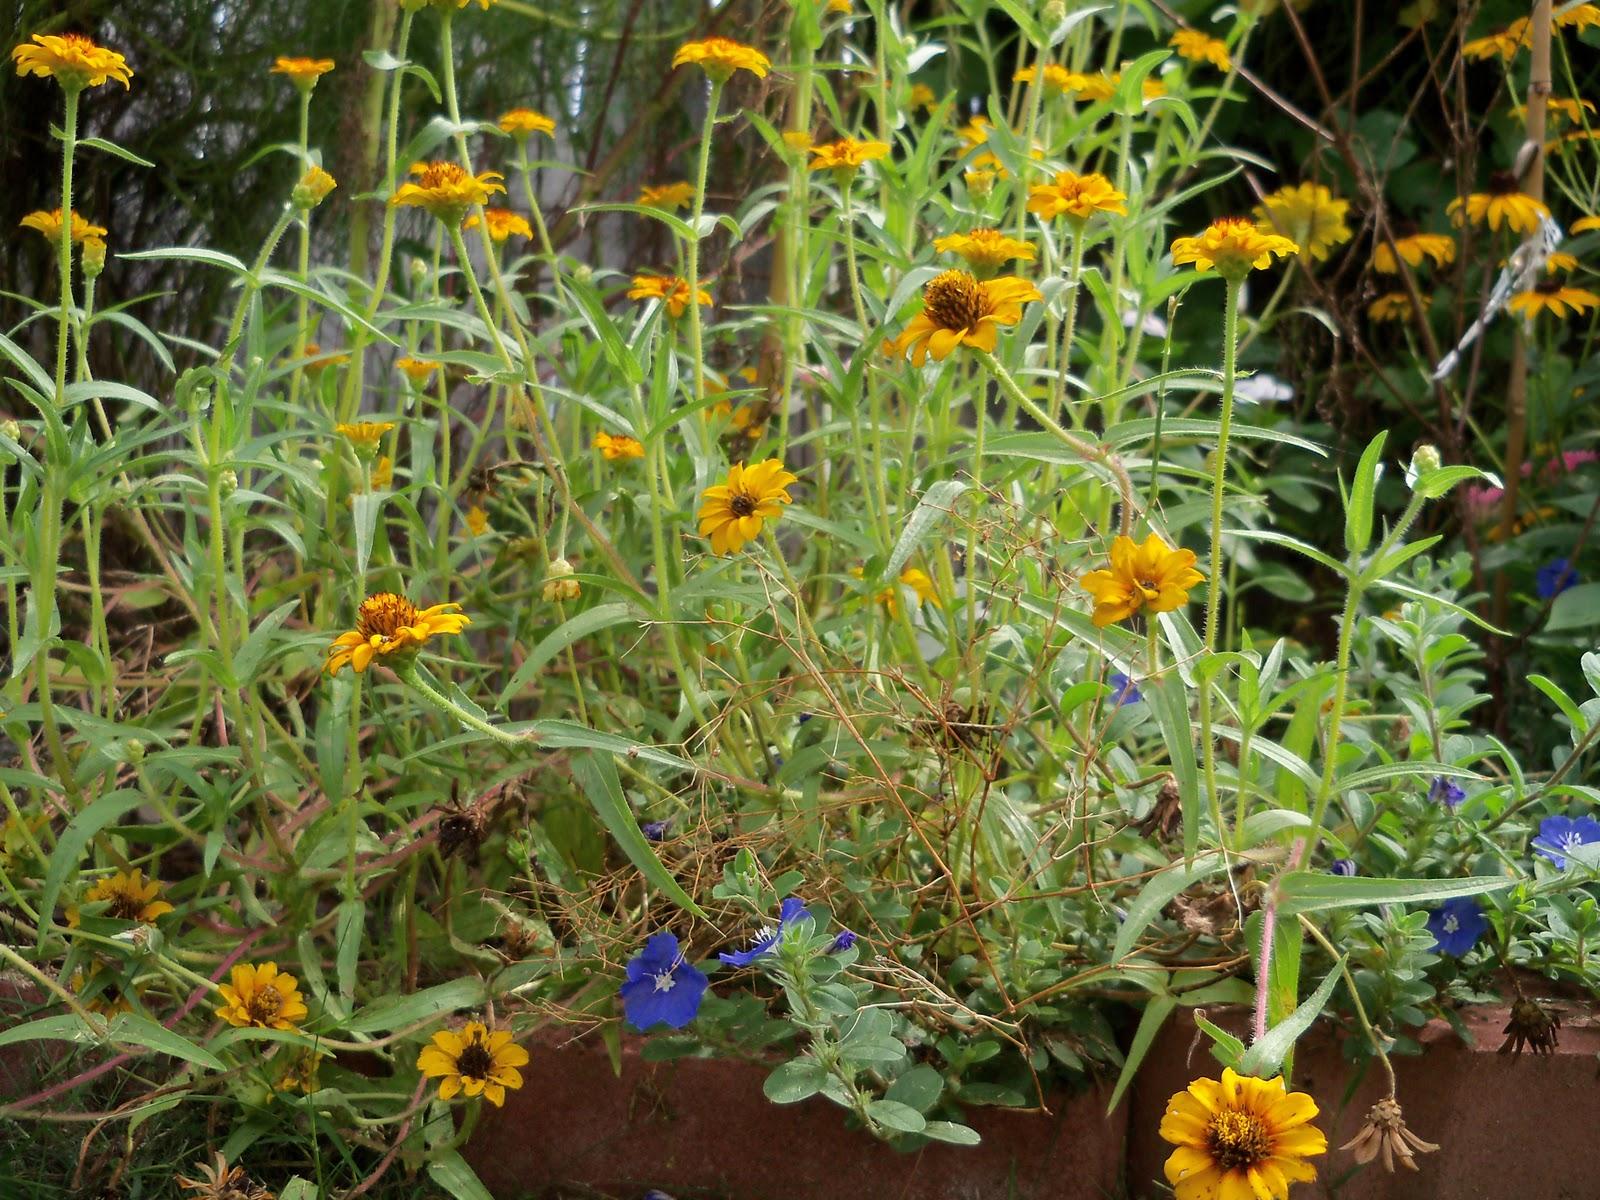 Gardening 2010, Part Three - 101_5207.JPG